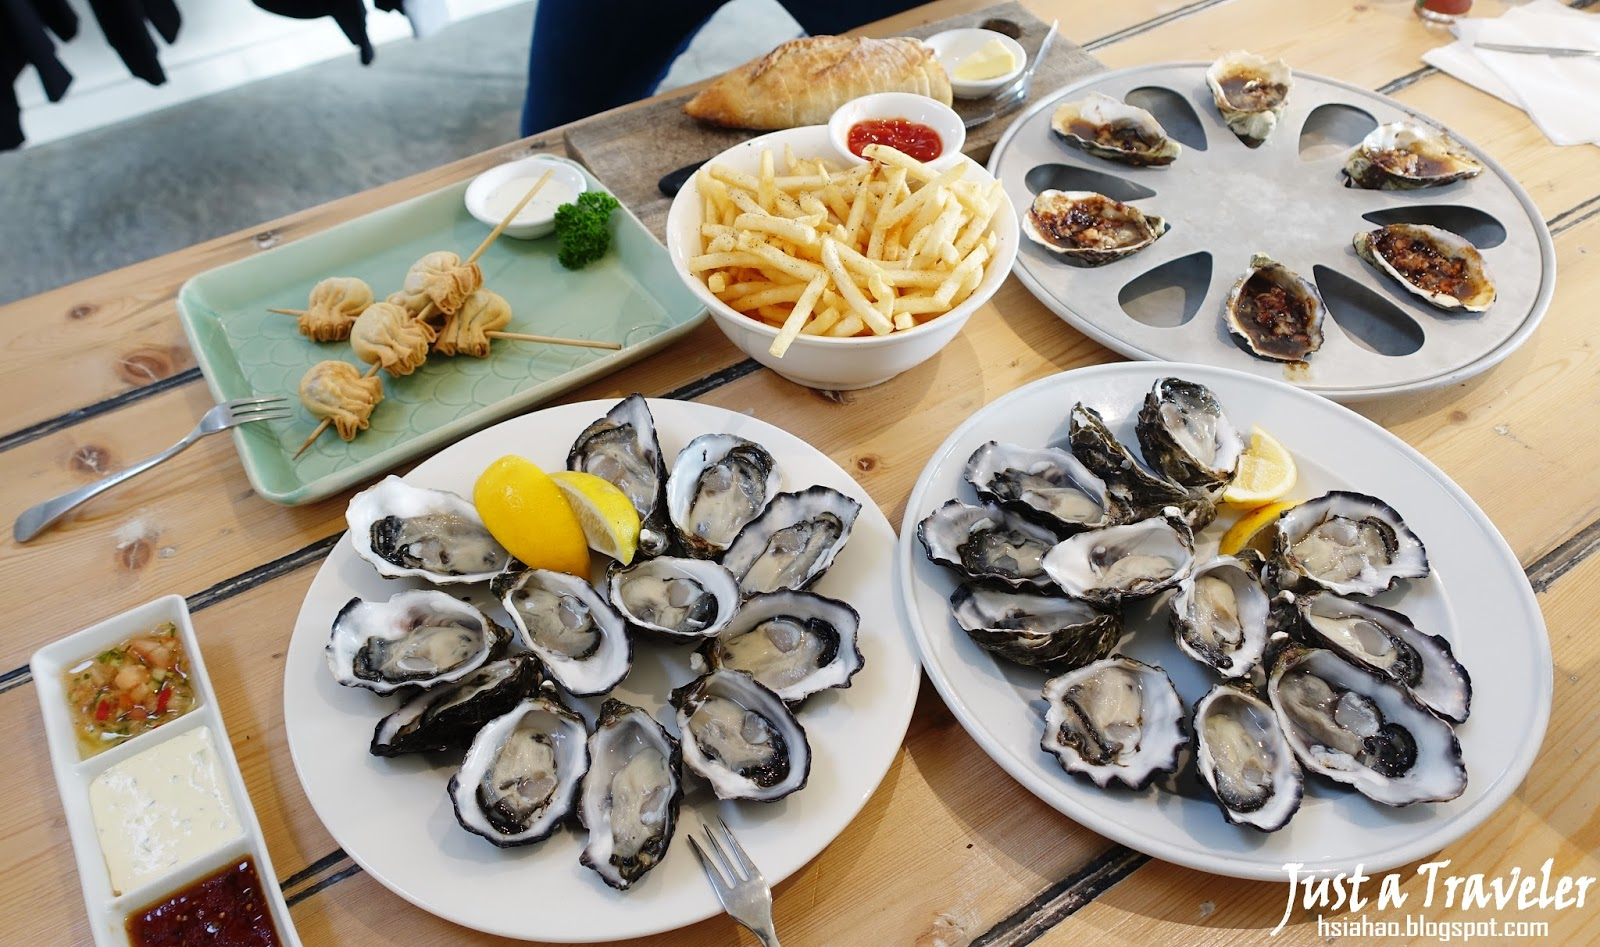 塔斯馬尼亞-美食-推薦-布魯尼島-Bruny-Island-生蠔農場-Oyster-Farm-澳洲-Tasmania-Tourist-Attraction-Australia